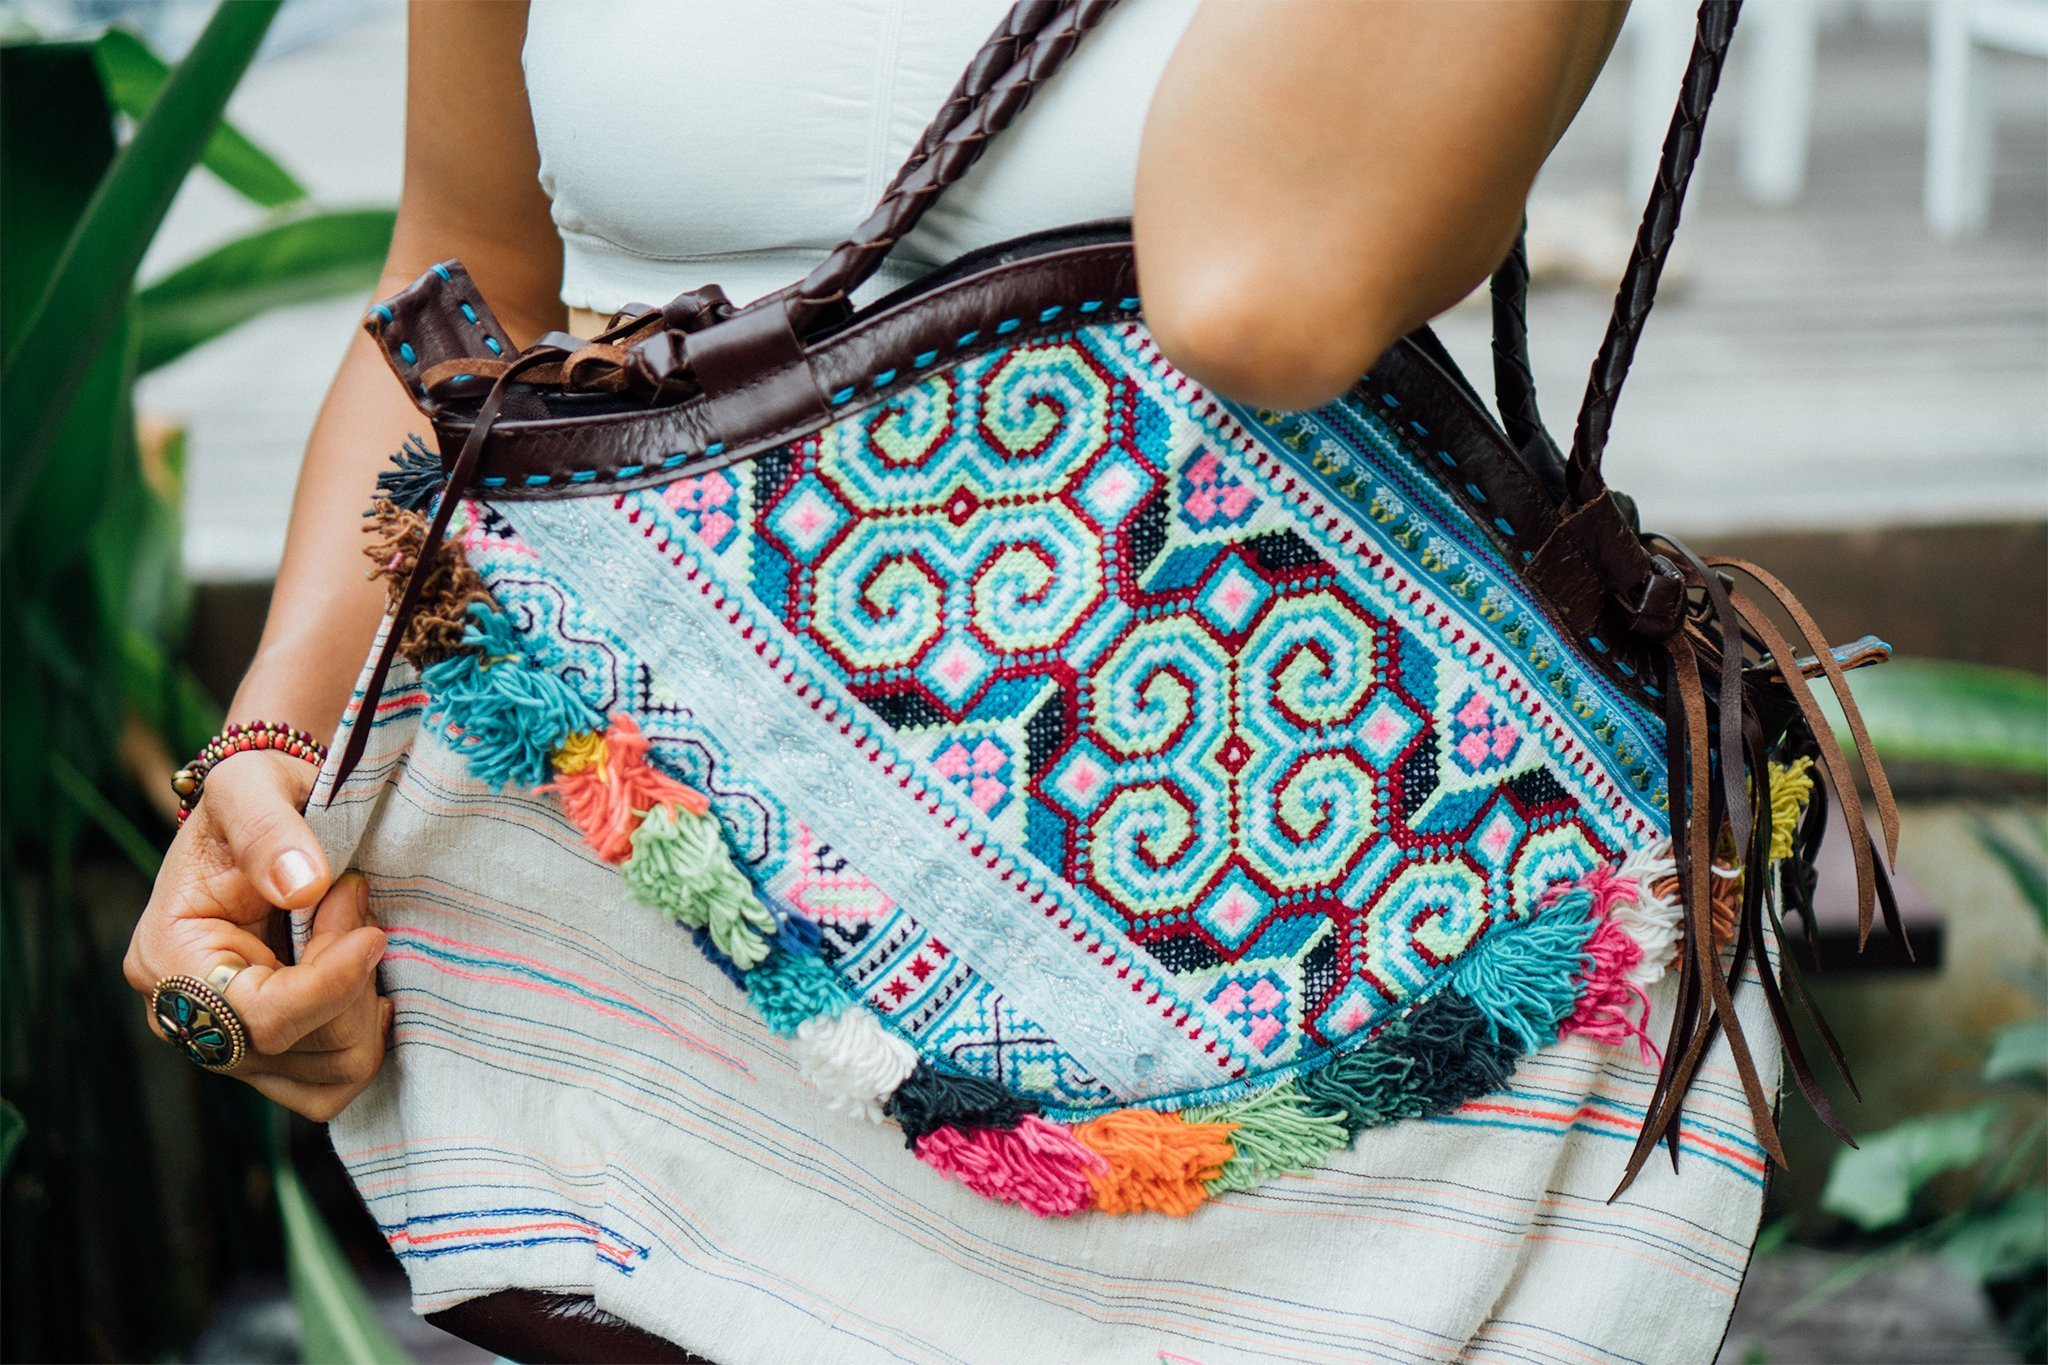 Changnoi Fair Trade Vintage Women Tote Bag, Hmong Tribal Shoulder Bag, Unique Ethnic Beach Bag with Colourful Tassels - handmade-bags